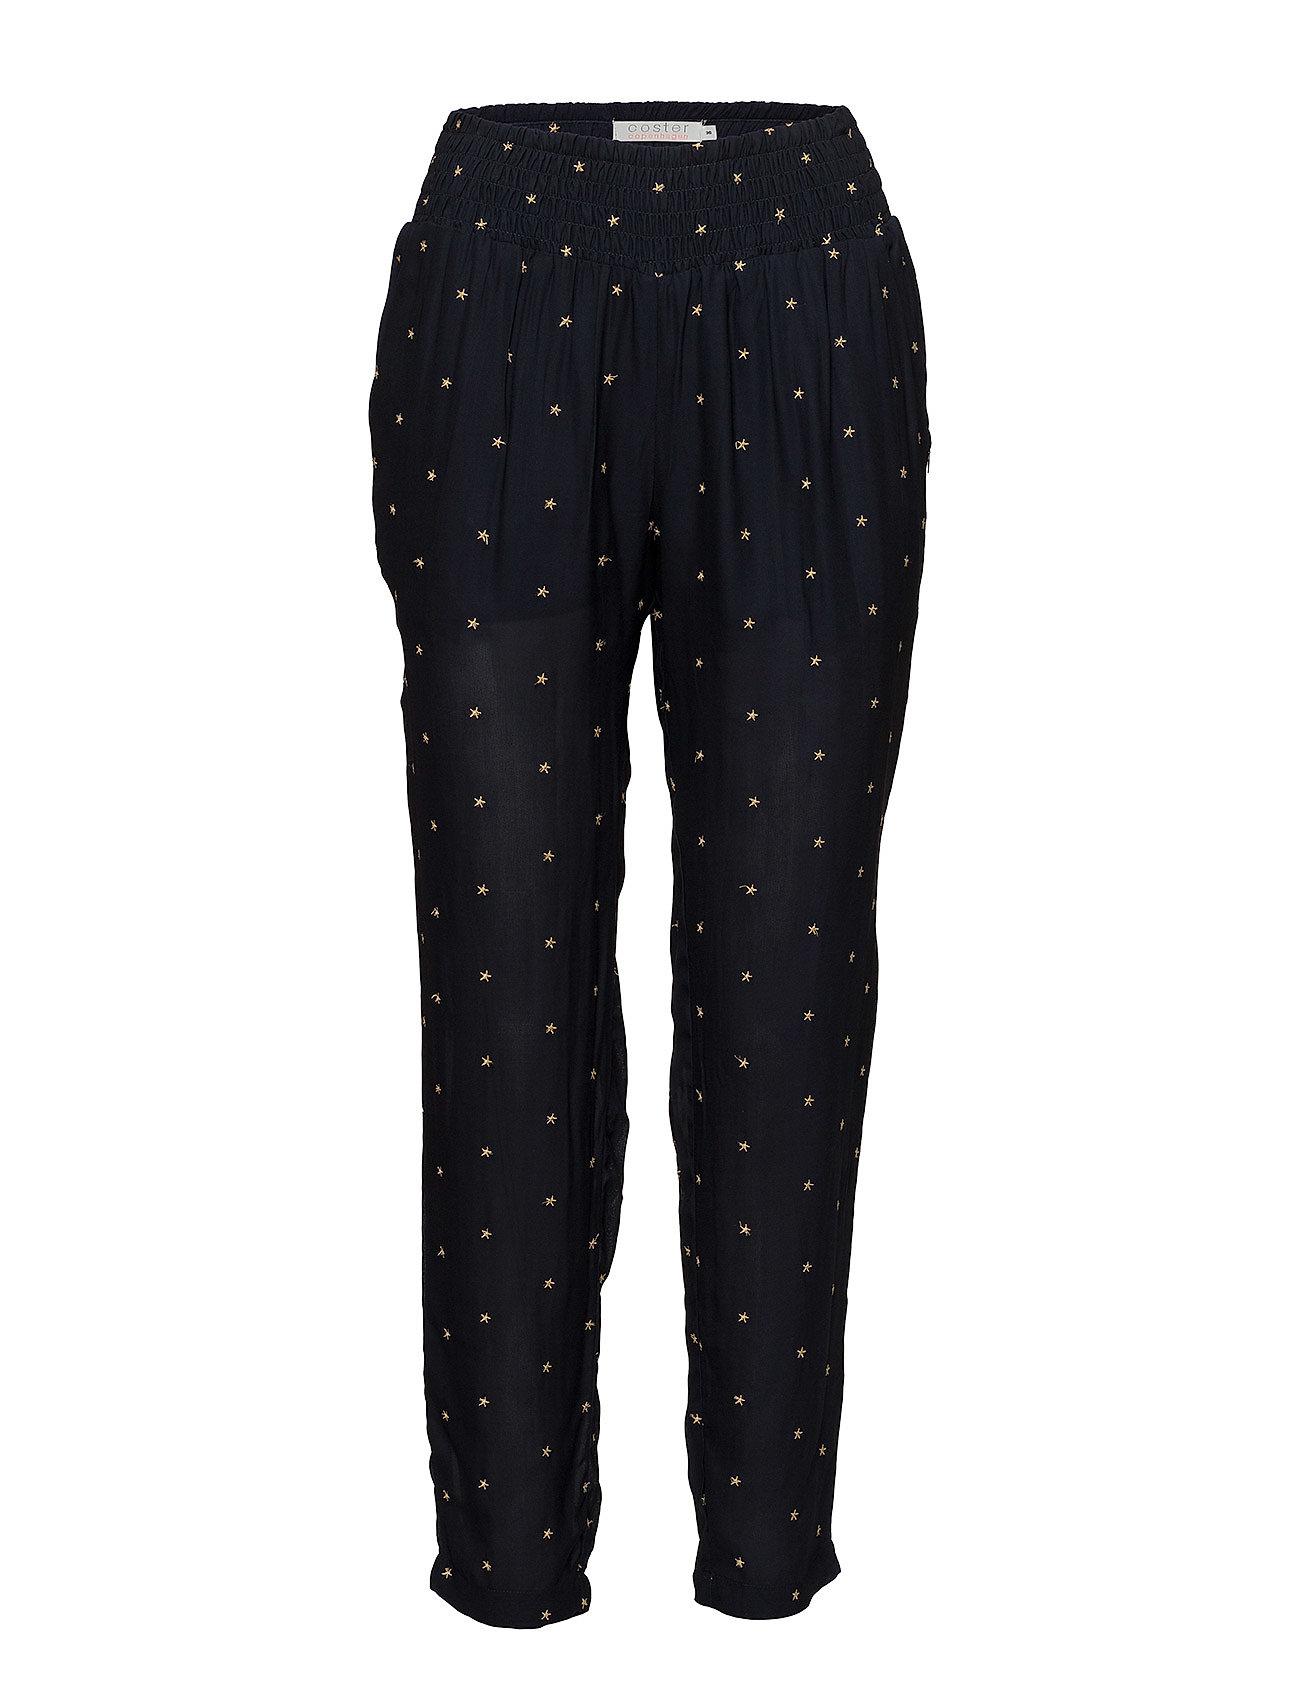 Coster Copenhagen Trousers w. embroideröd stars Byxor